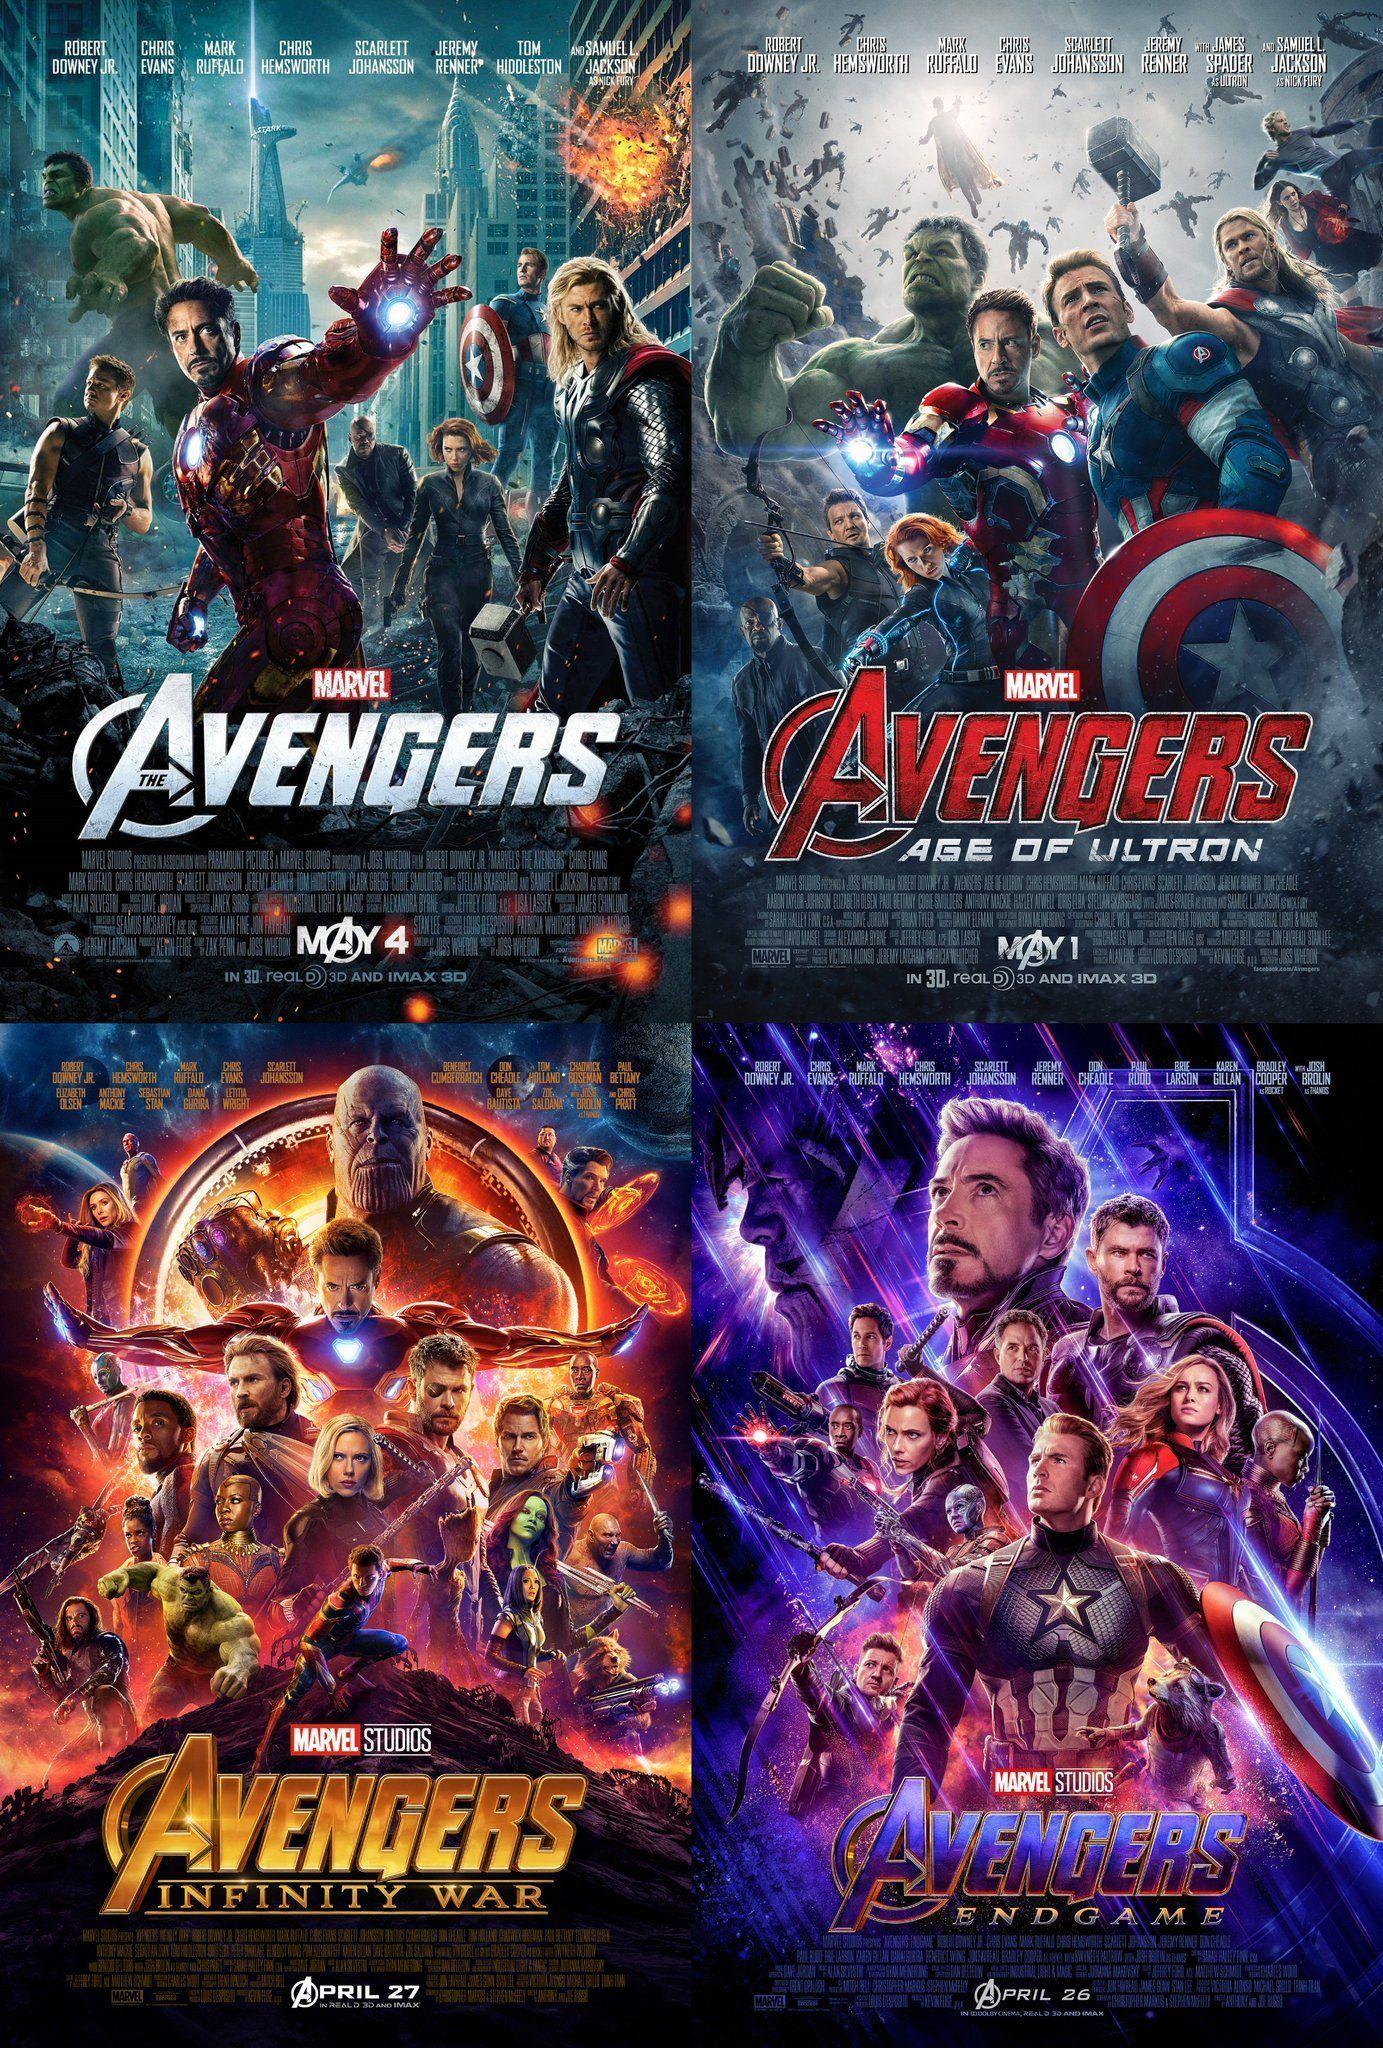 Marvels Avengers Infinity War Poster Wall Decor 2018 Movie Promo Prints Set